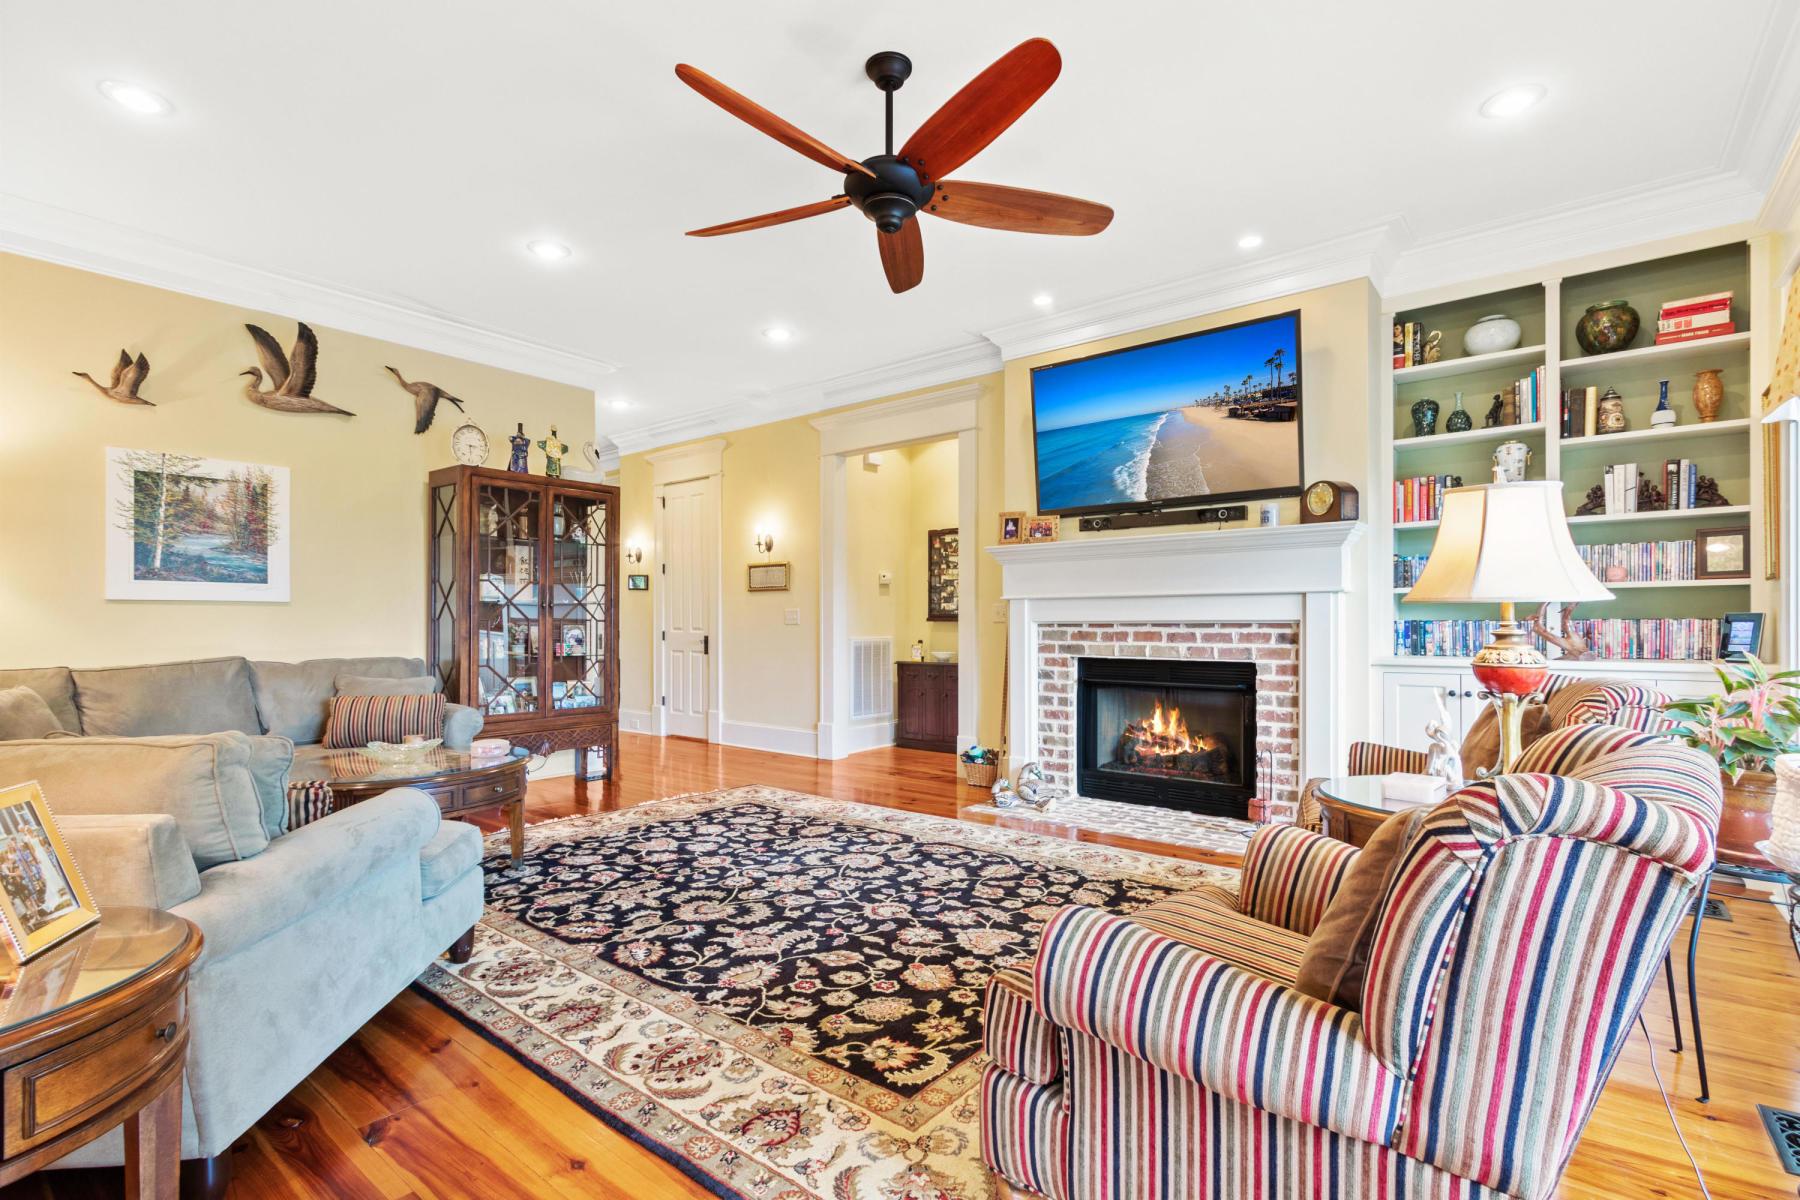 Broughton Hall Homes For Sale - 2058 Lakeshore, Pinopolis, SC - 24